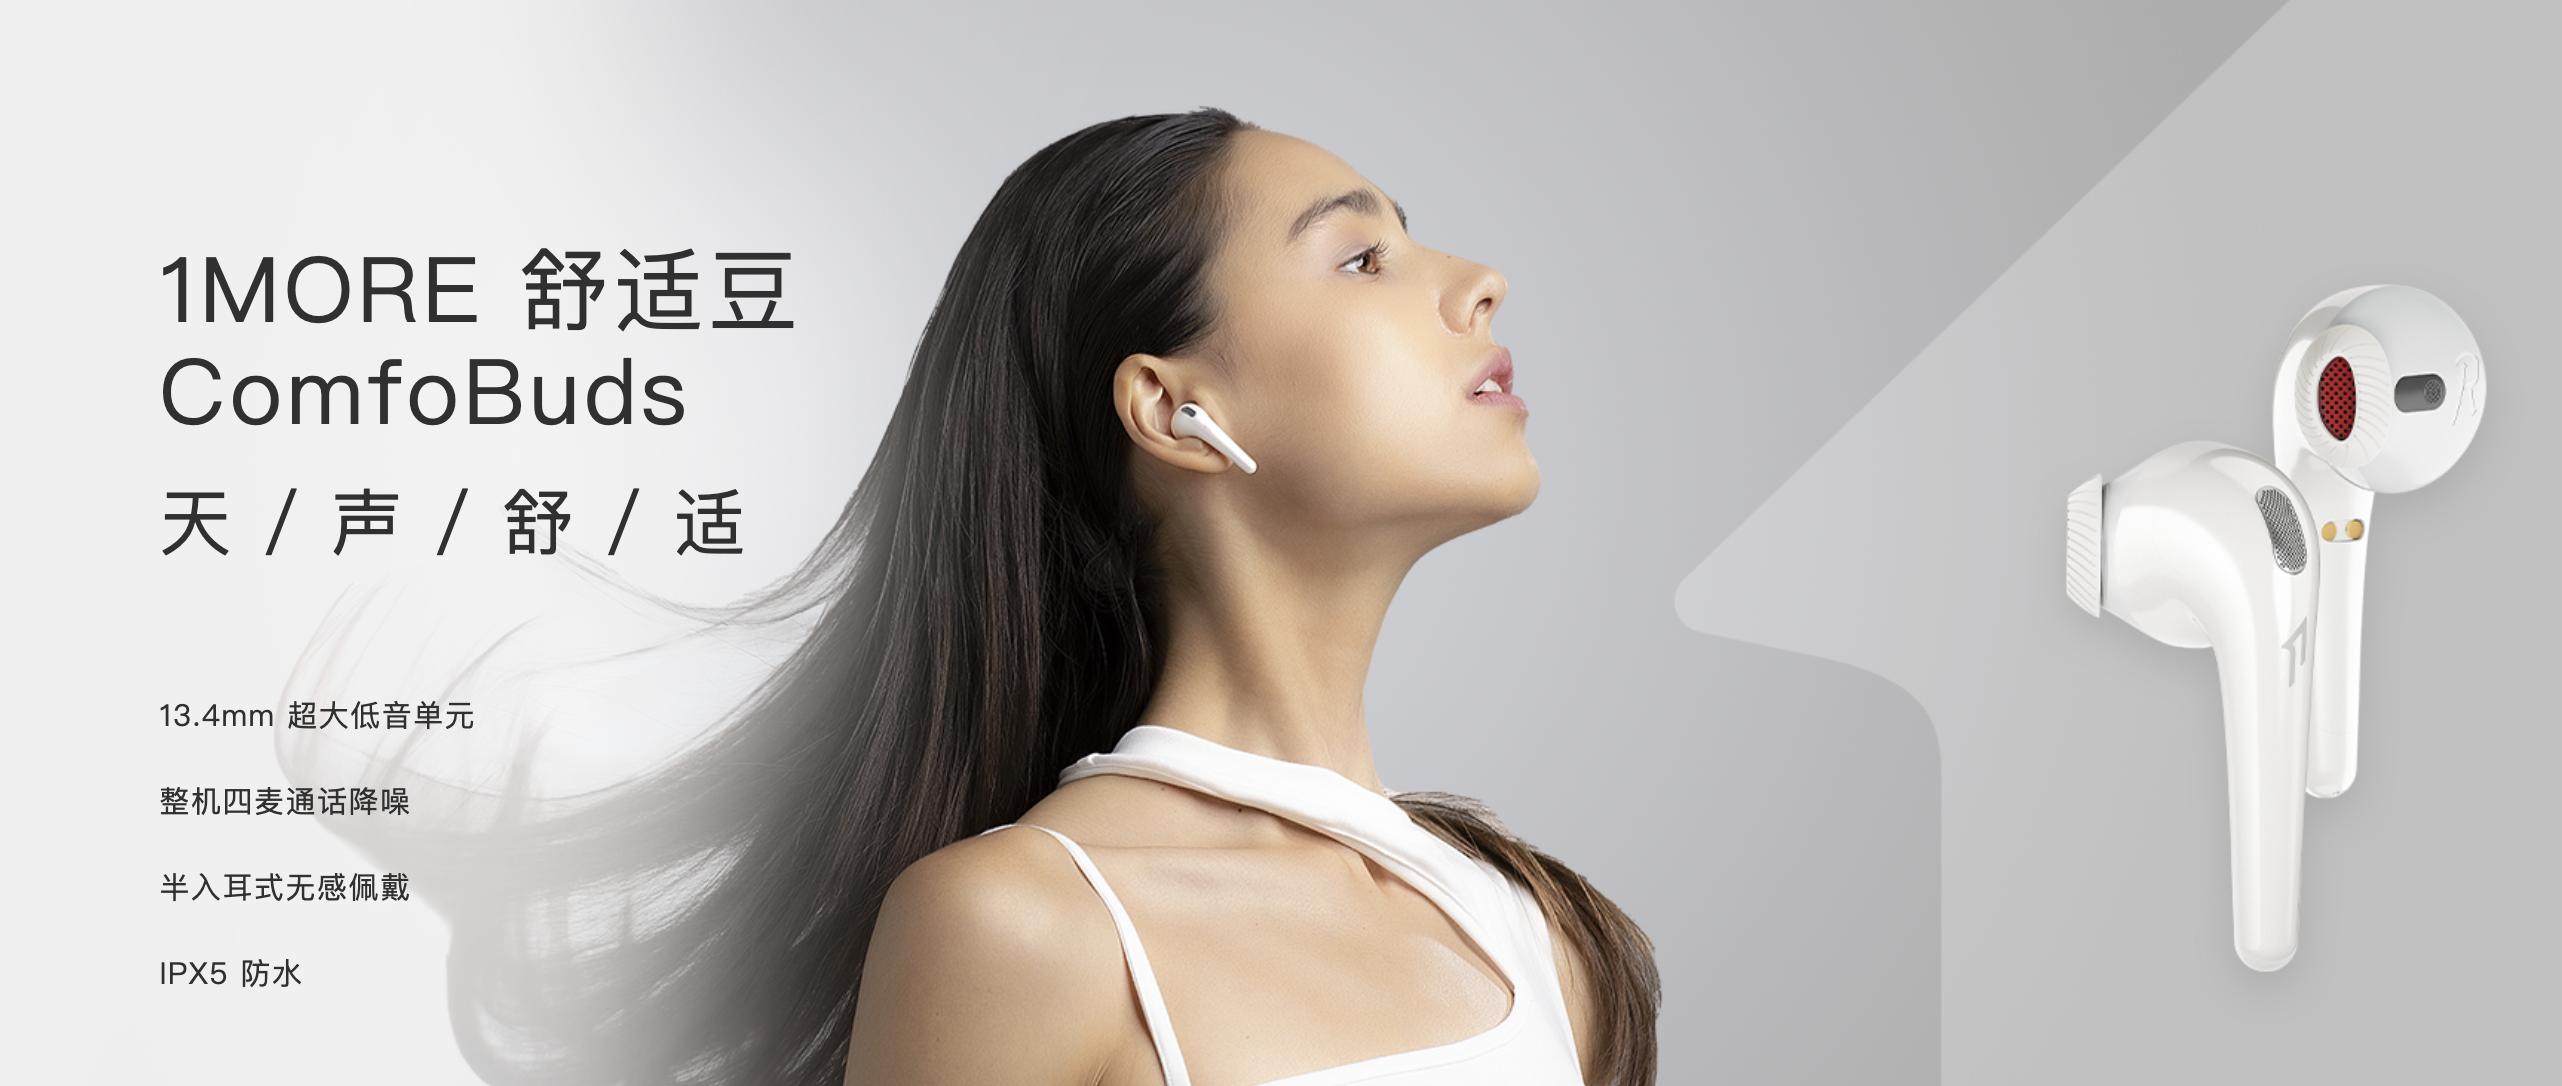 1MORE ComfoBuds舒适豆体验:轻质高颜值性能耳机